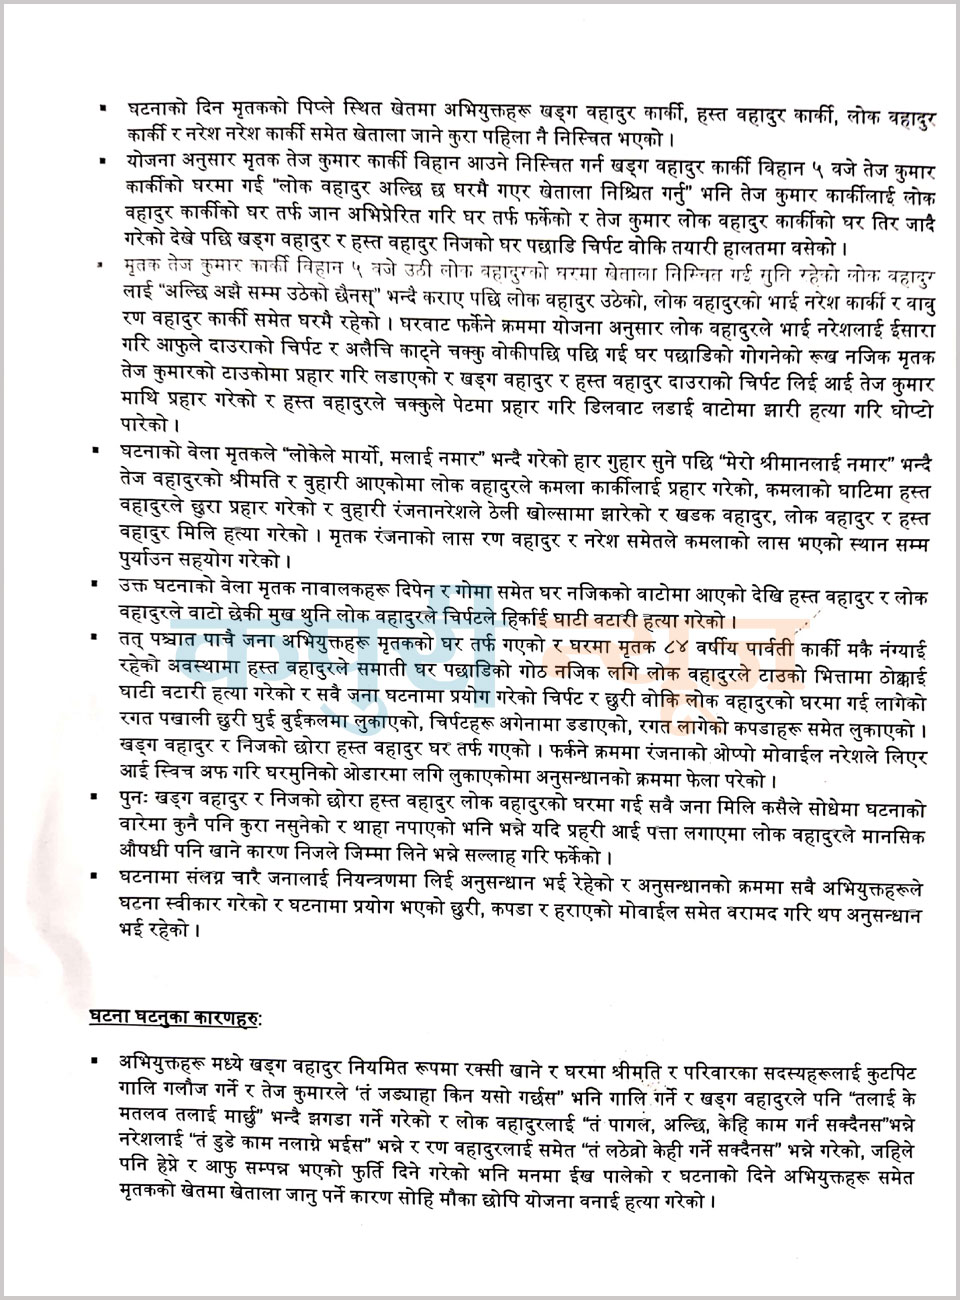 Madi-Ghatana-Pratibedan-2